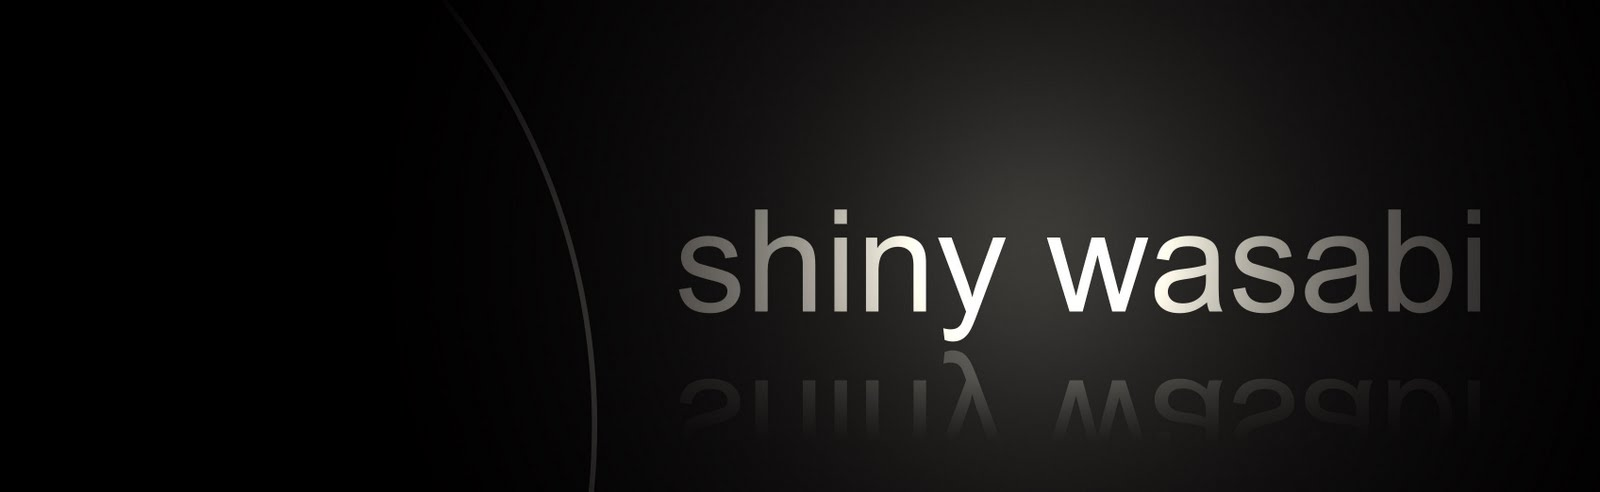 Shiny Wasabi